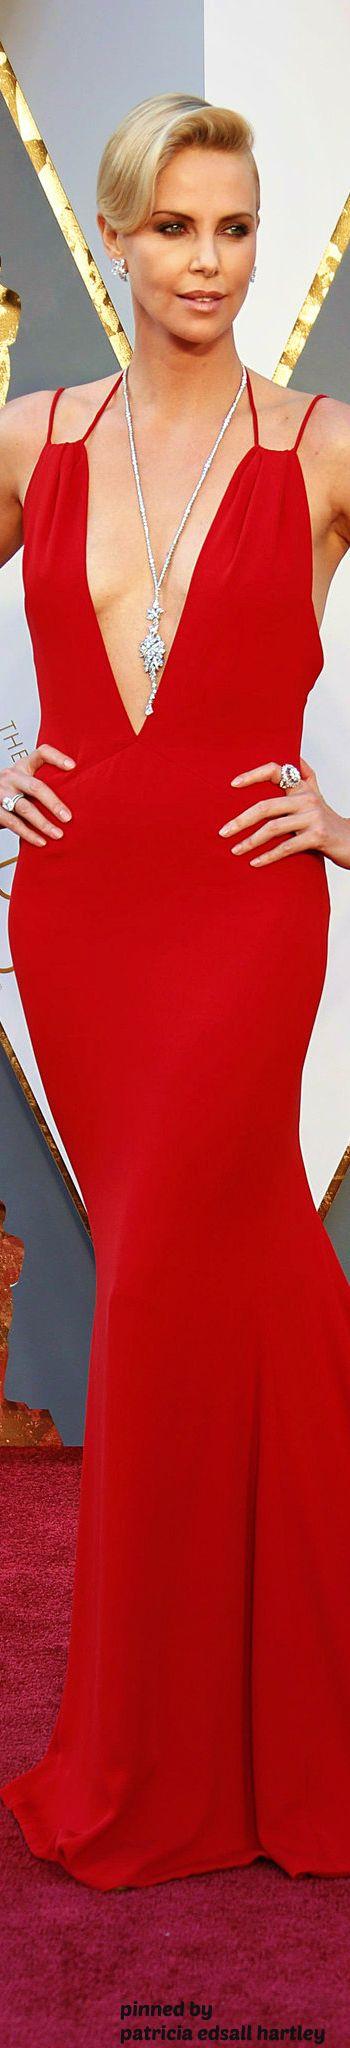 Charlize Theron - 2016 Oscars